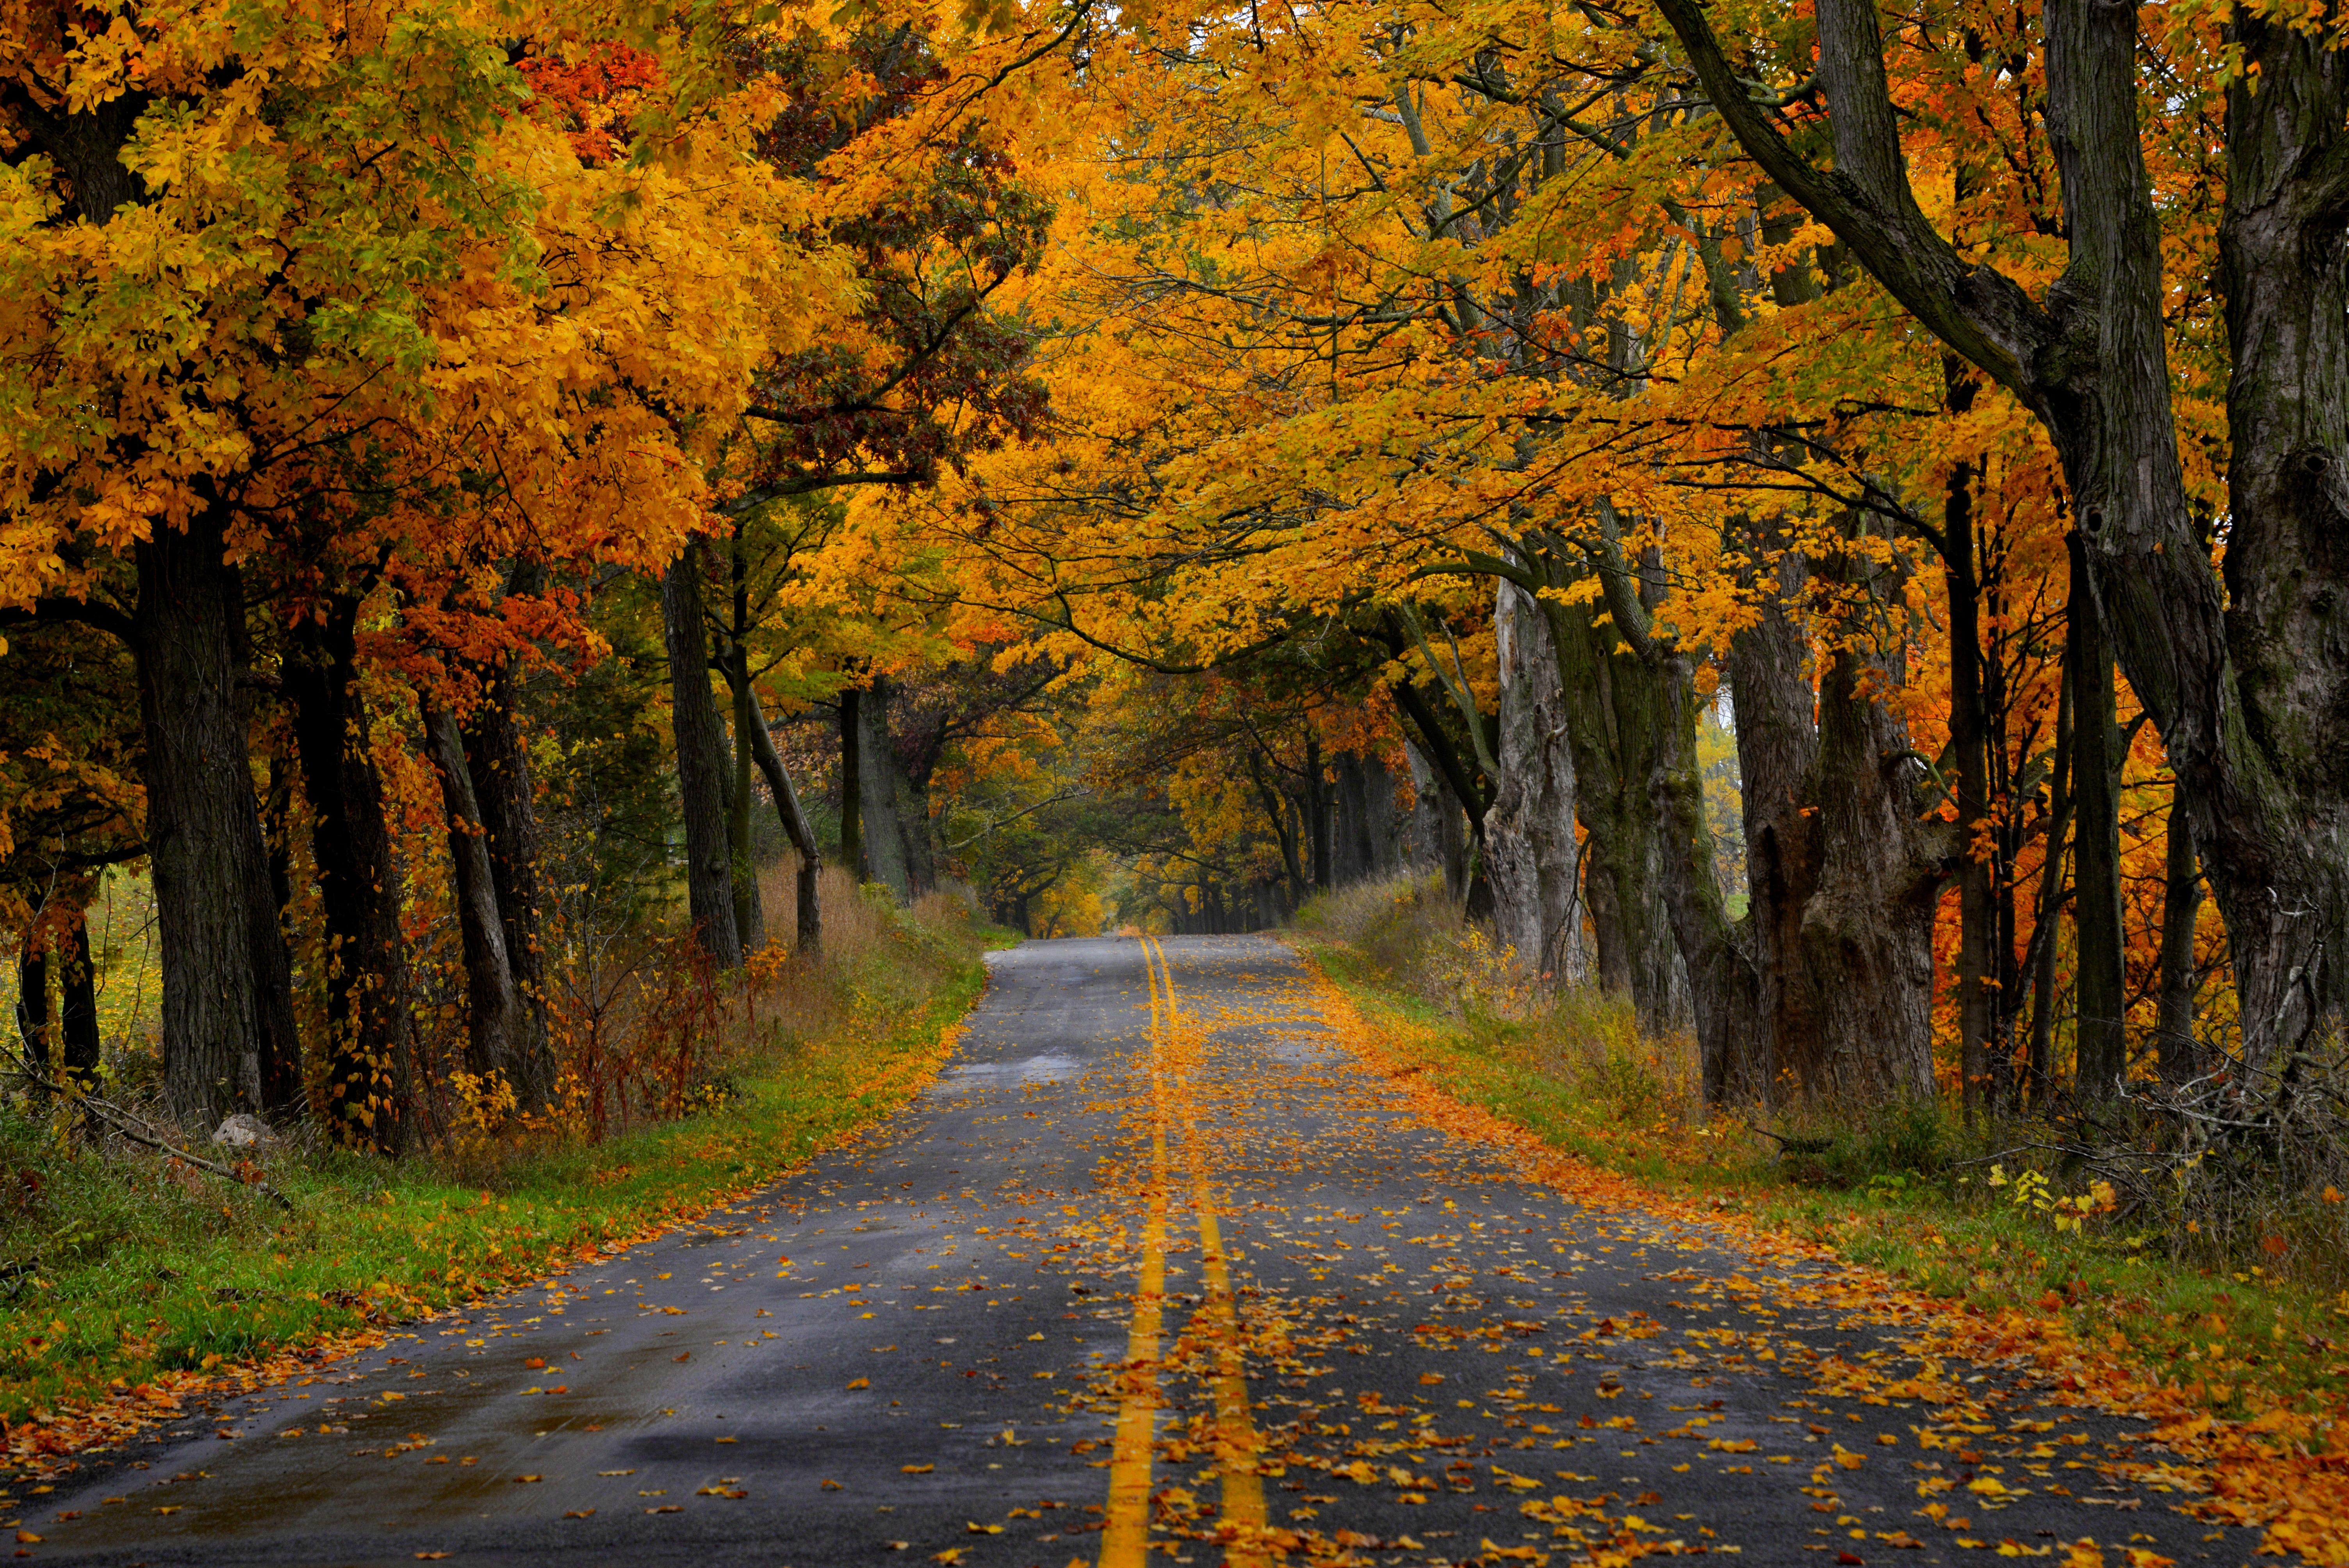 Road in autumn photo